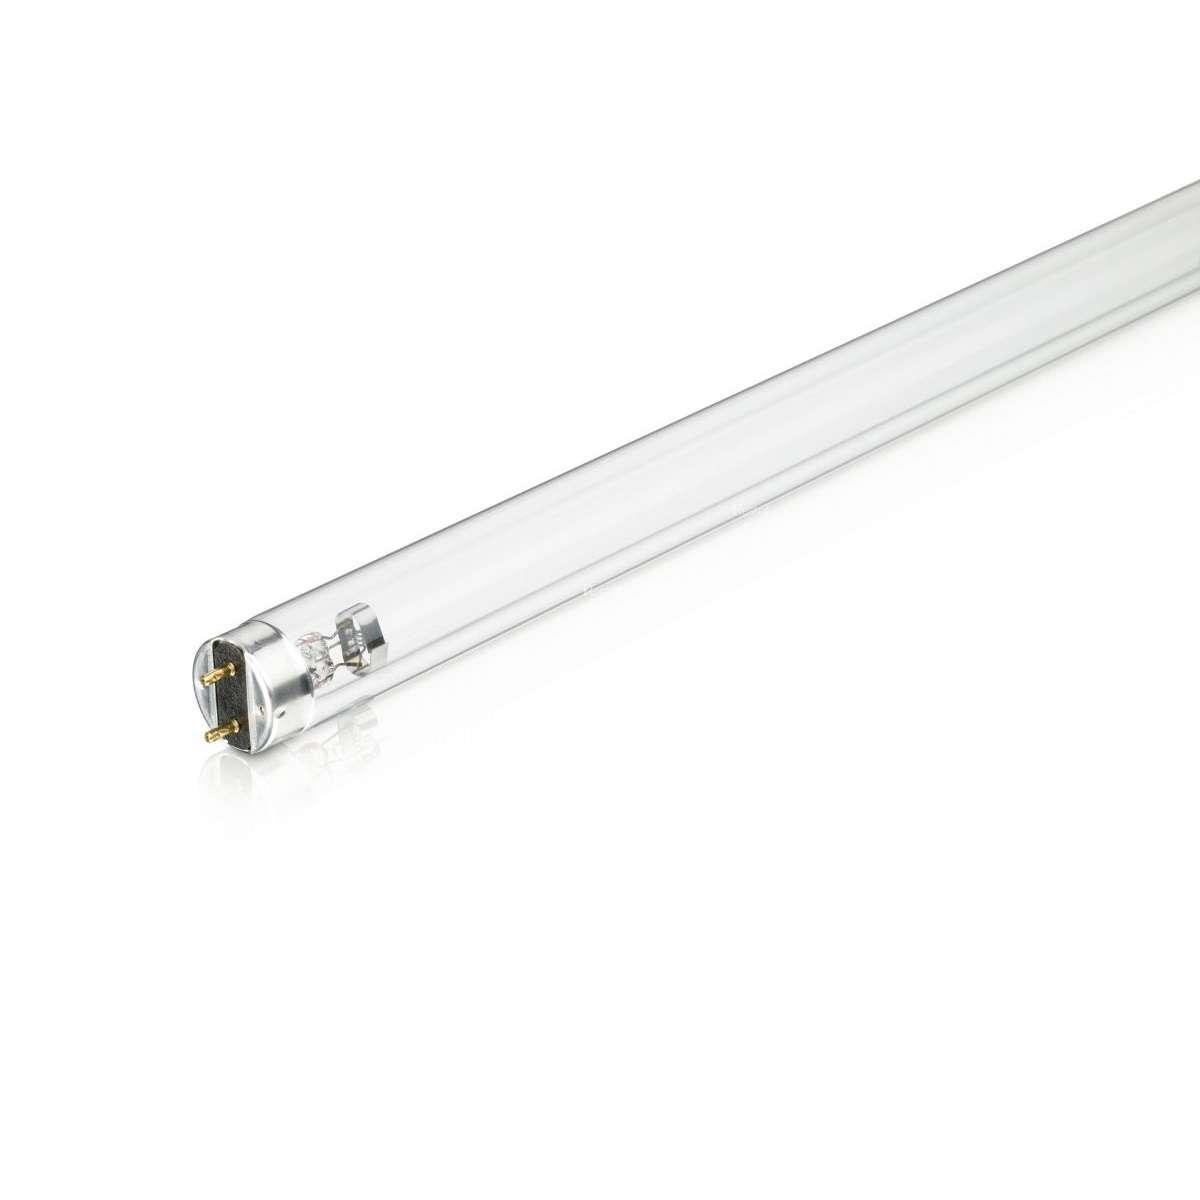 Лампа бактерицидная Ledvance TIBERA UVC T8 30W G13 арт. 4058075499249 безозоновая